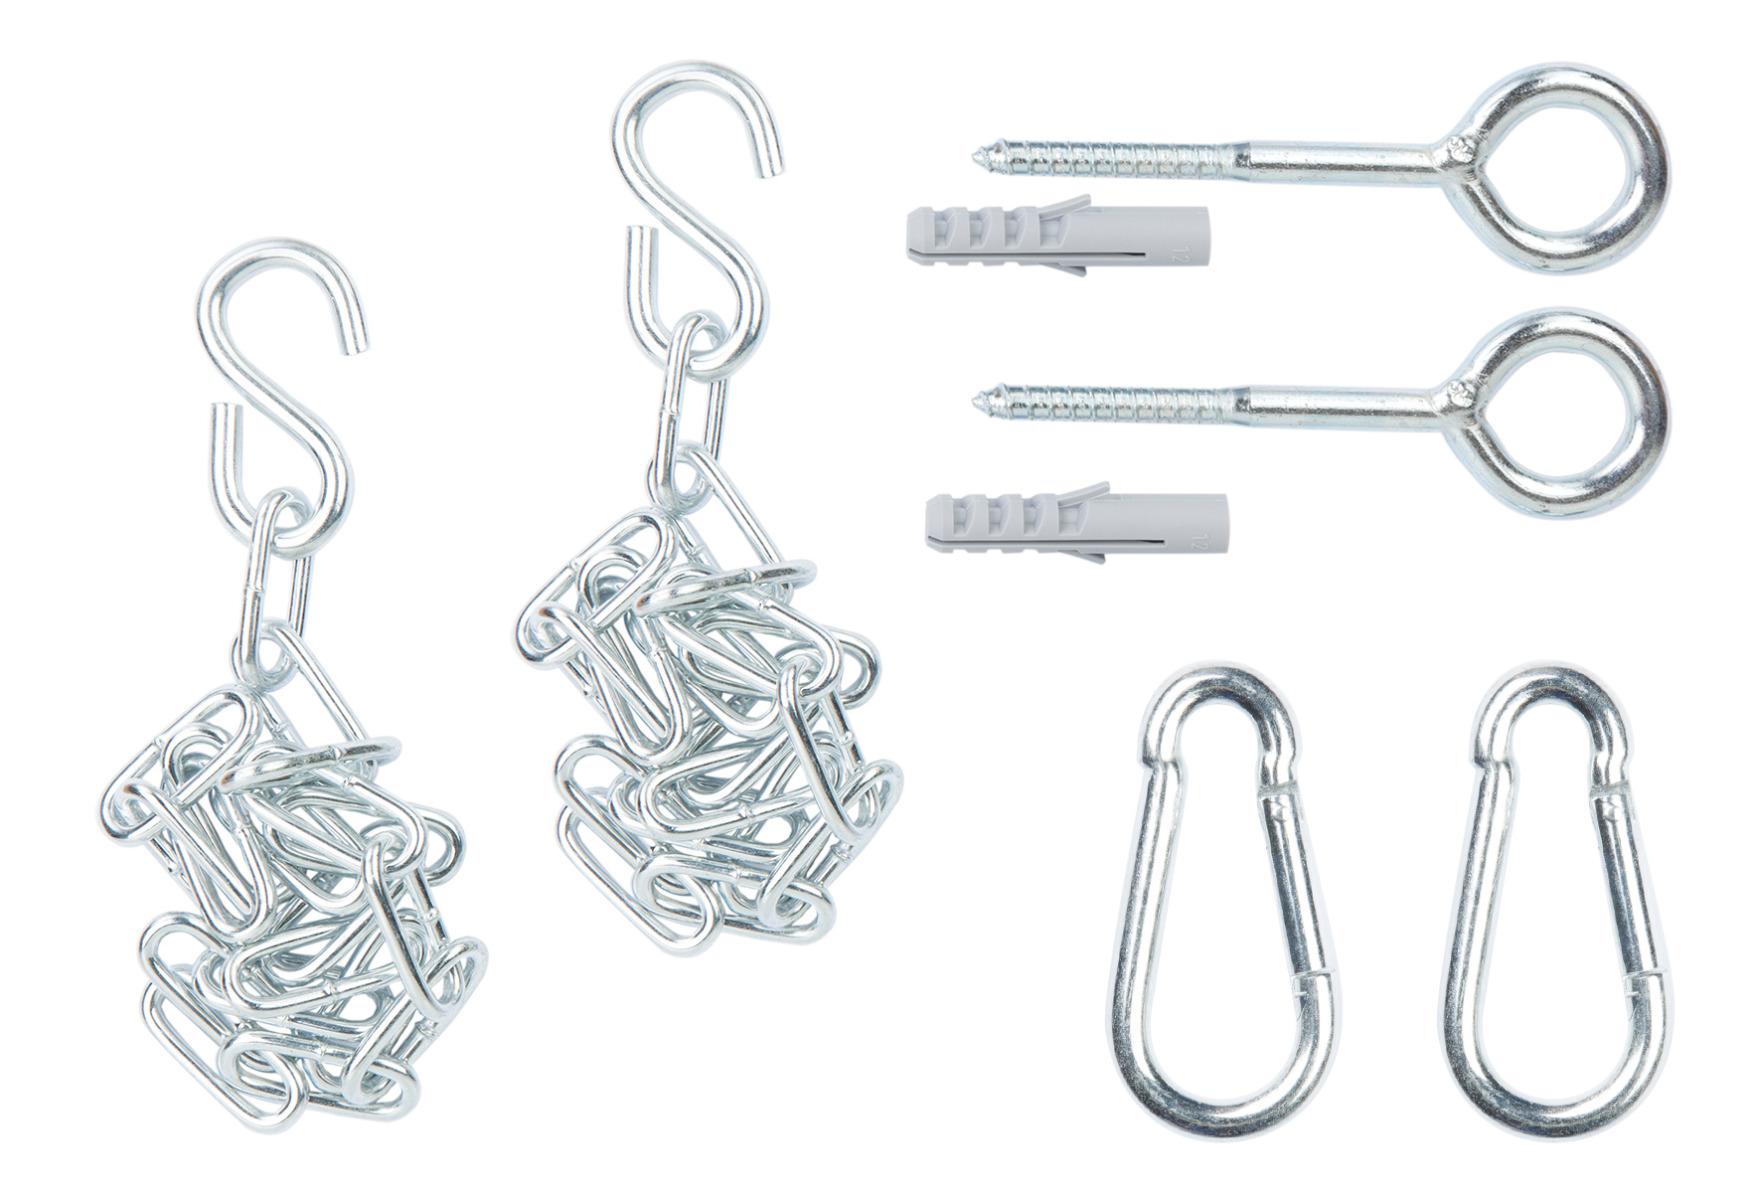 Hangmatbevestiging 'Complete' Metall - Tropilex �